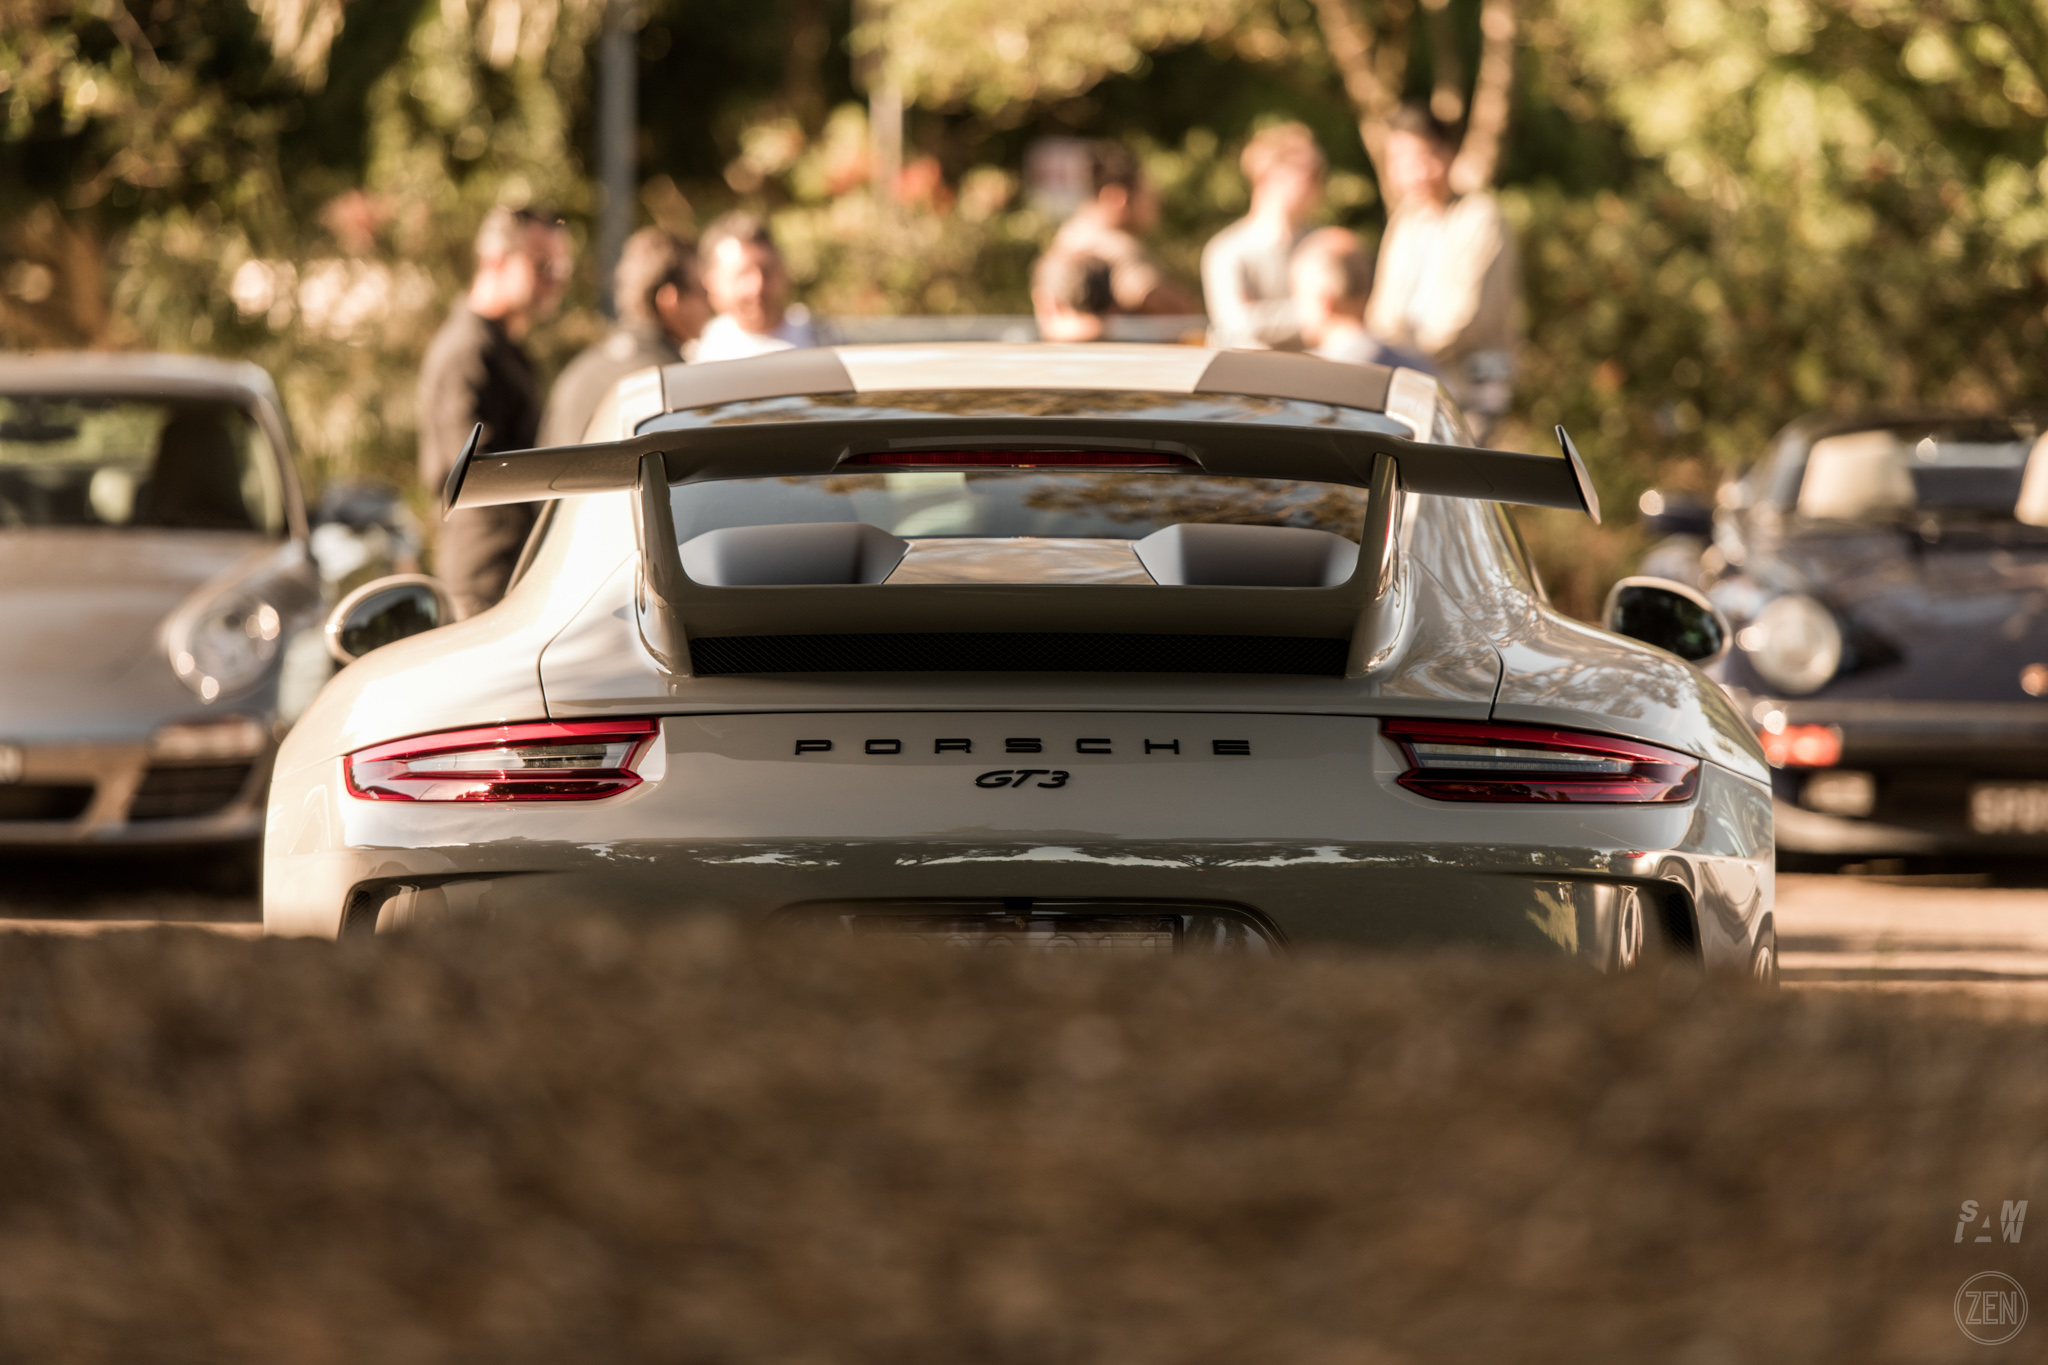 2019-10-27 - Autohaus Porsches & Coffee 139